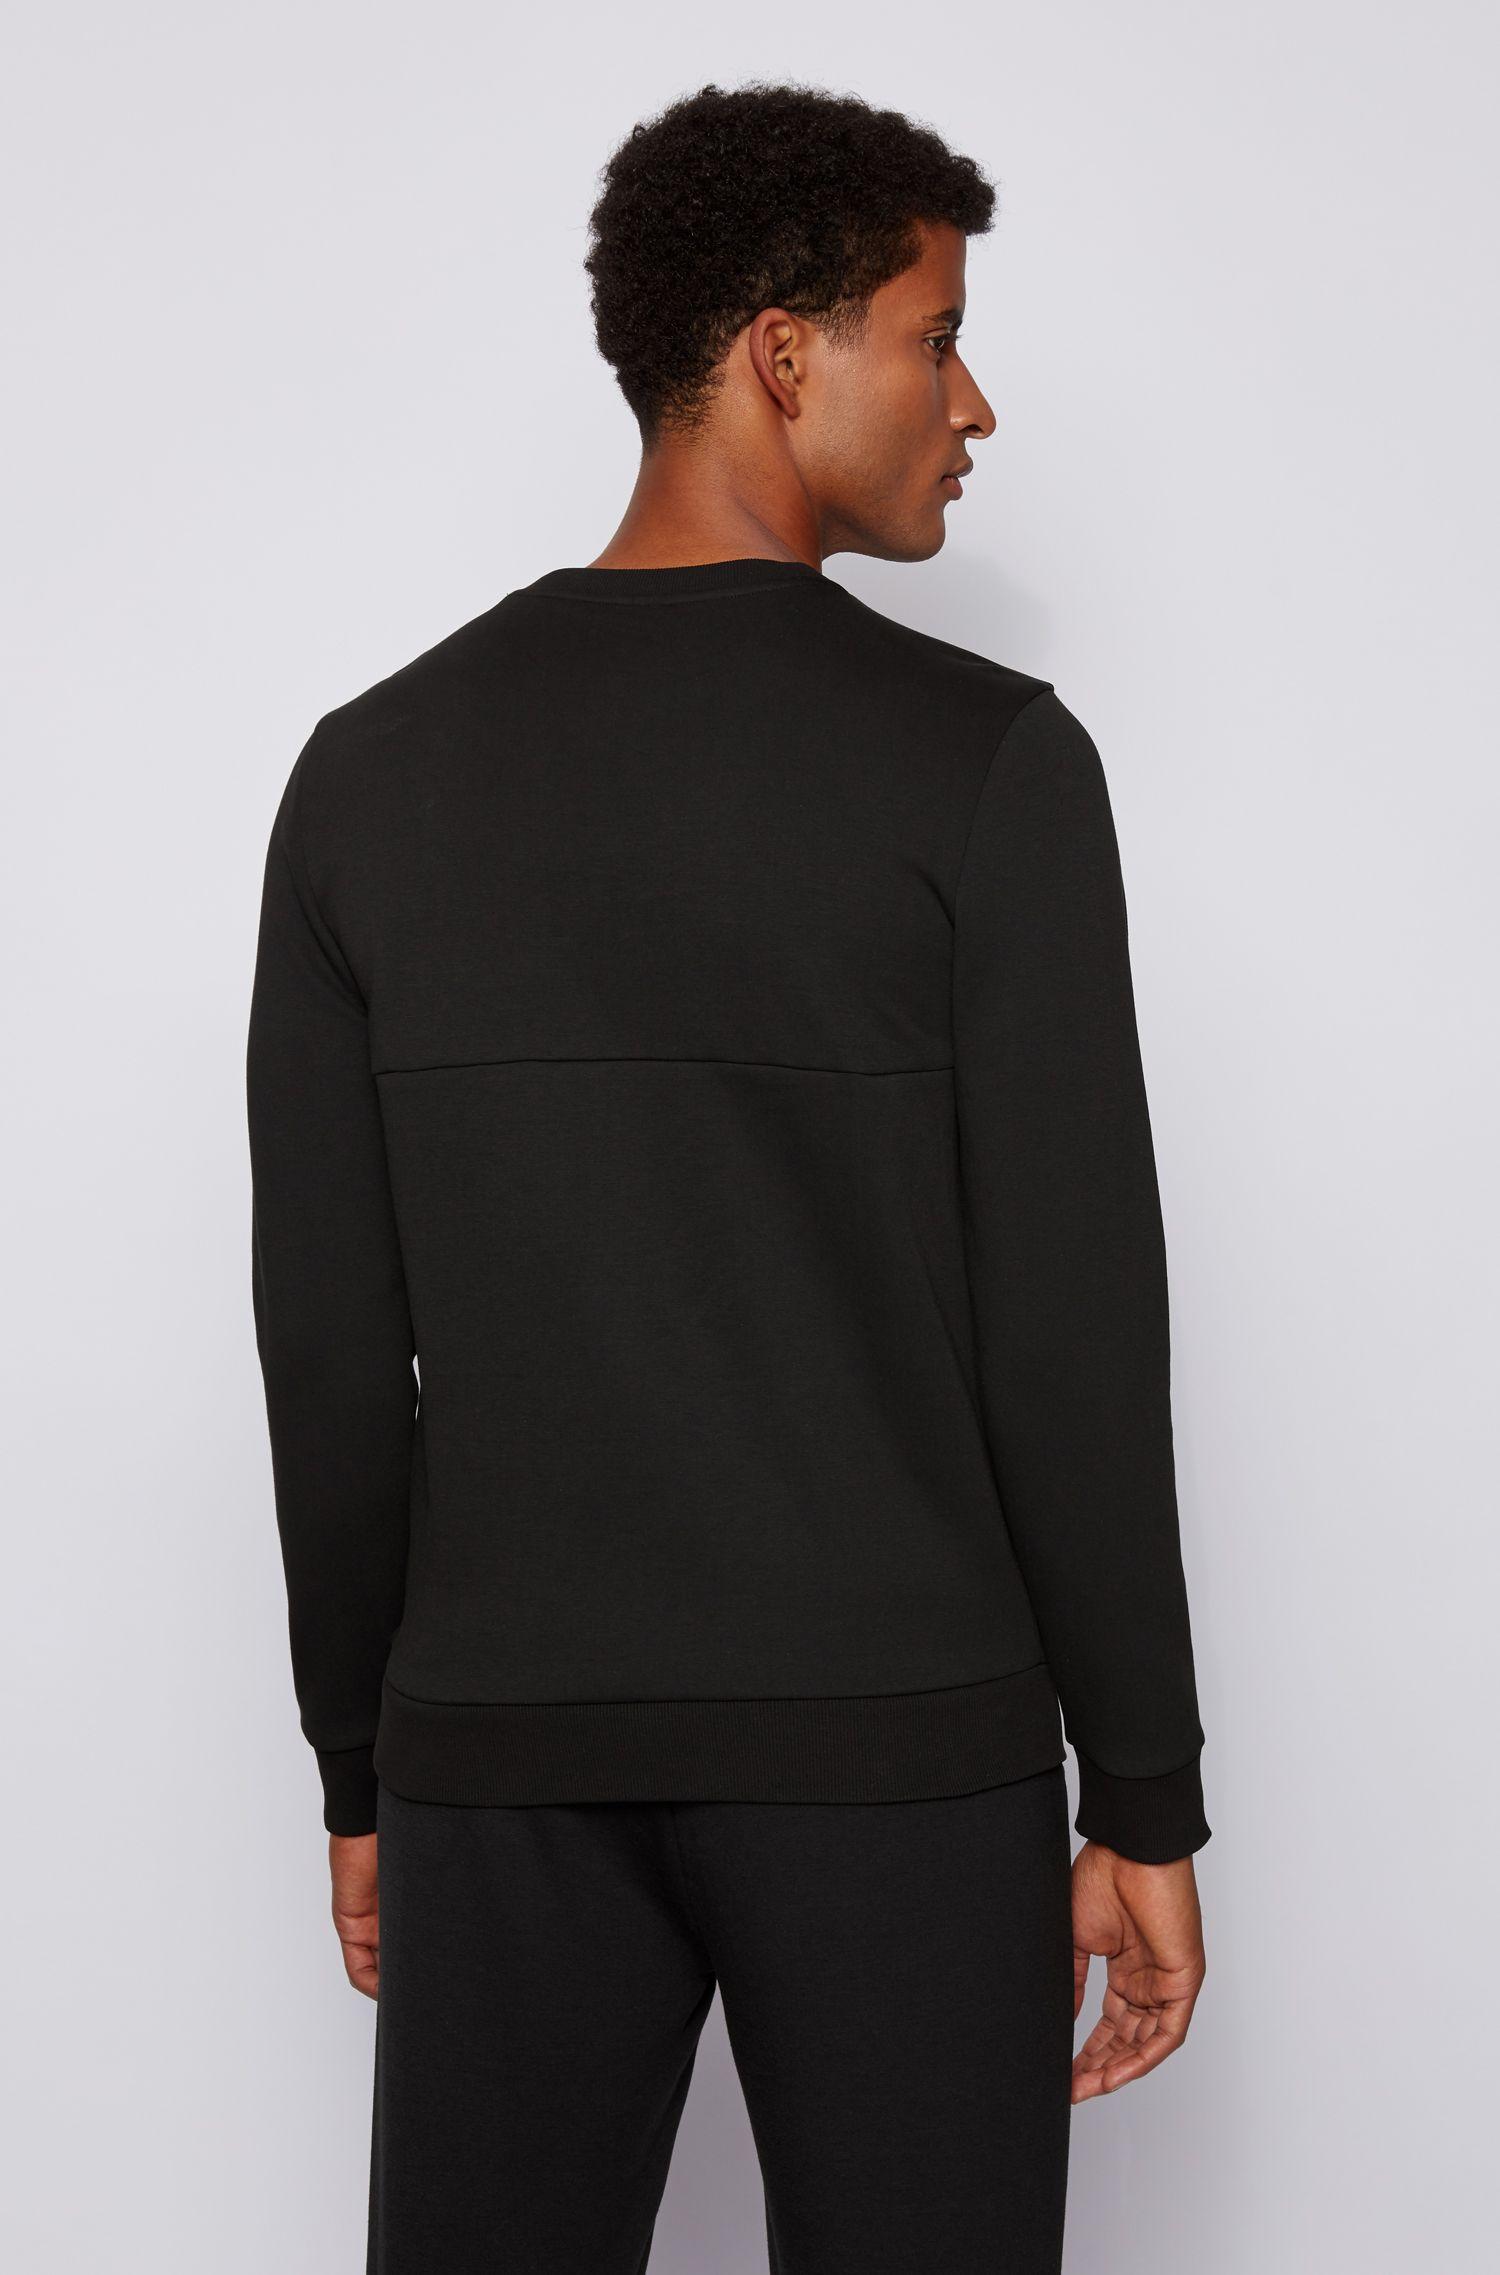 salbo Slim fit sweater with printed logo - black BOSS | Sweatshirt | 50434921009